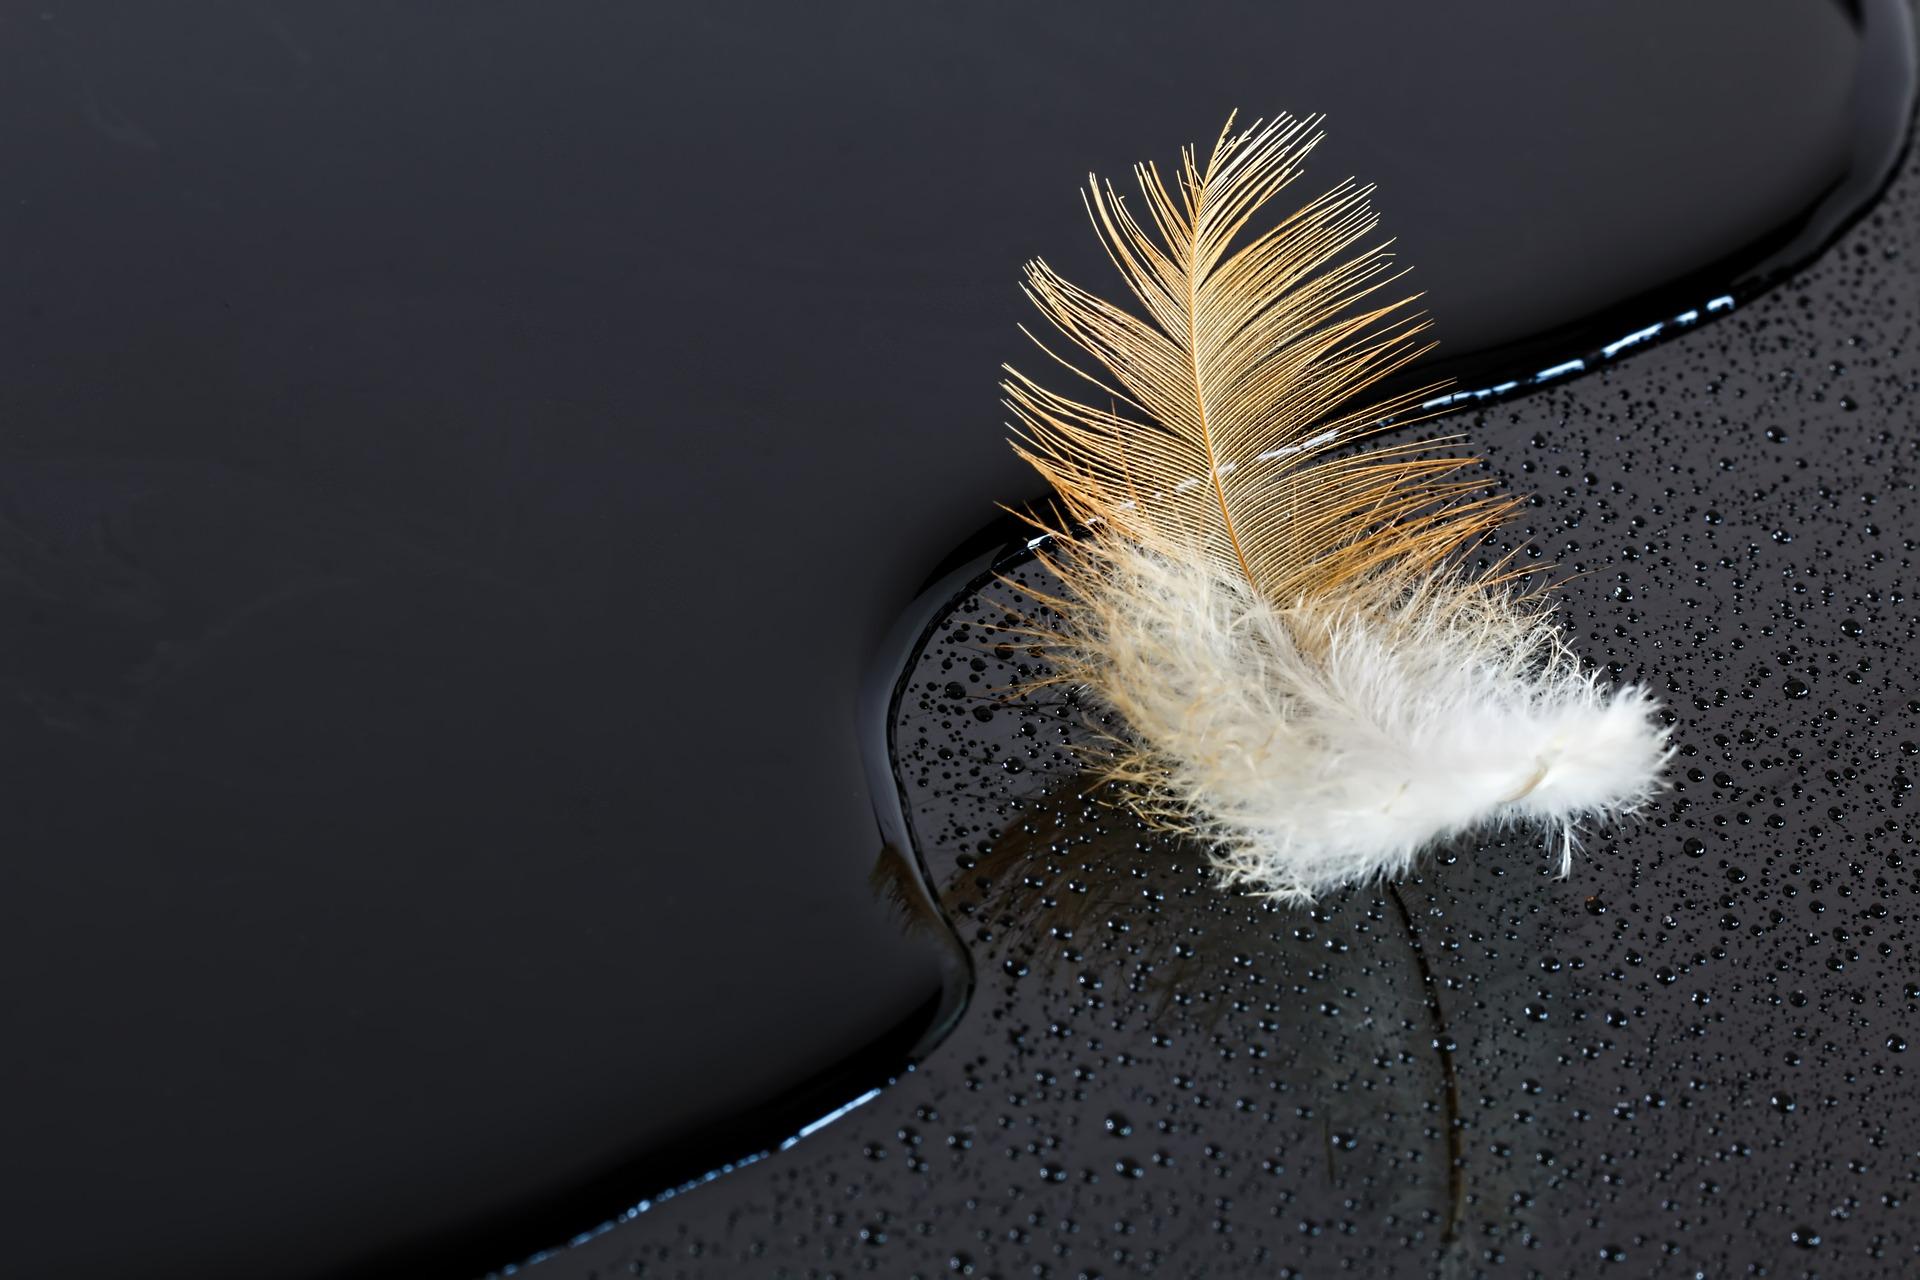 feather-406761_1920.jpg